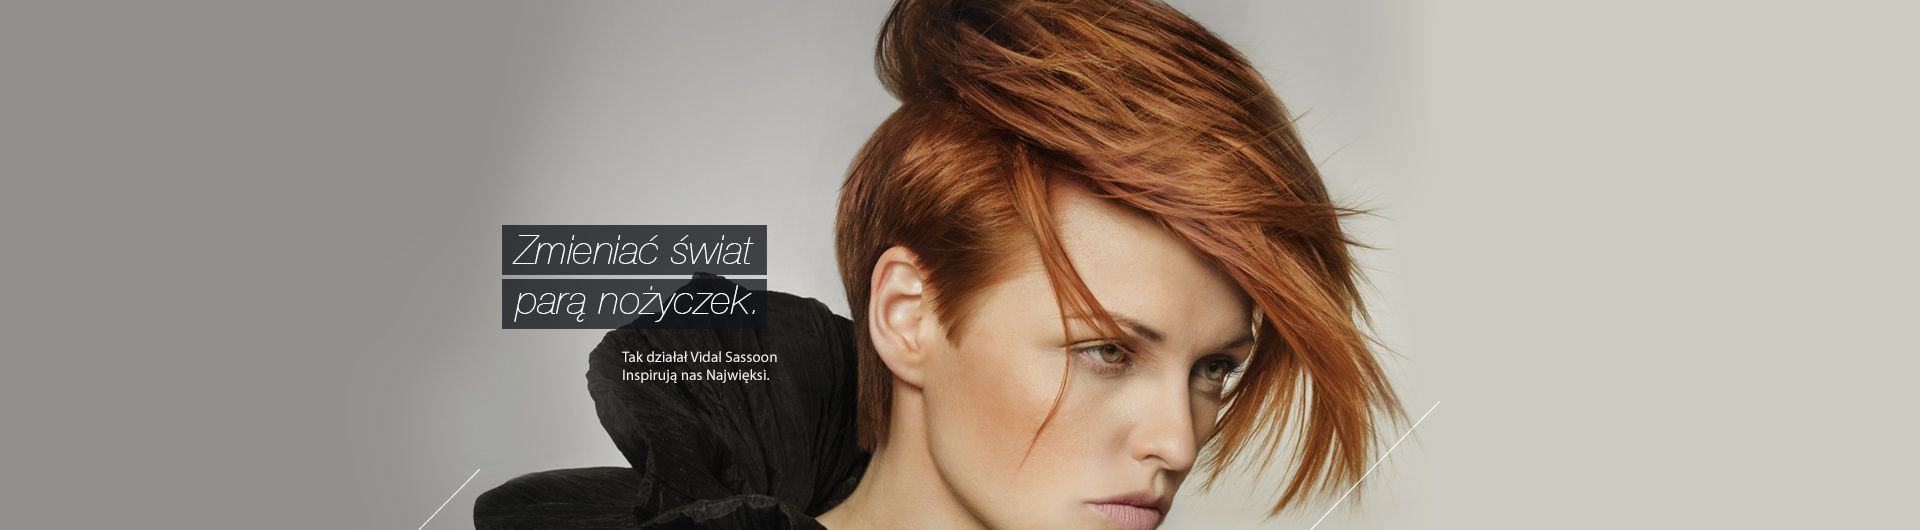 Klimczak hair desingers